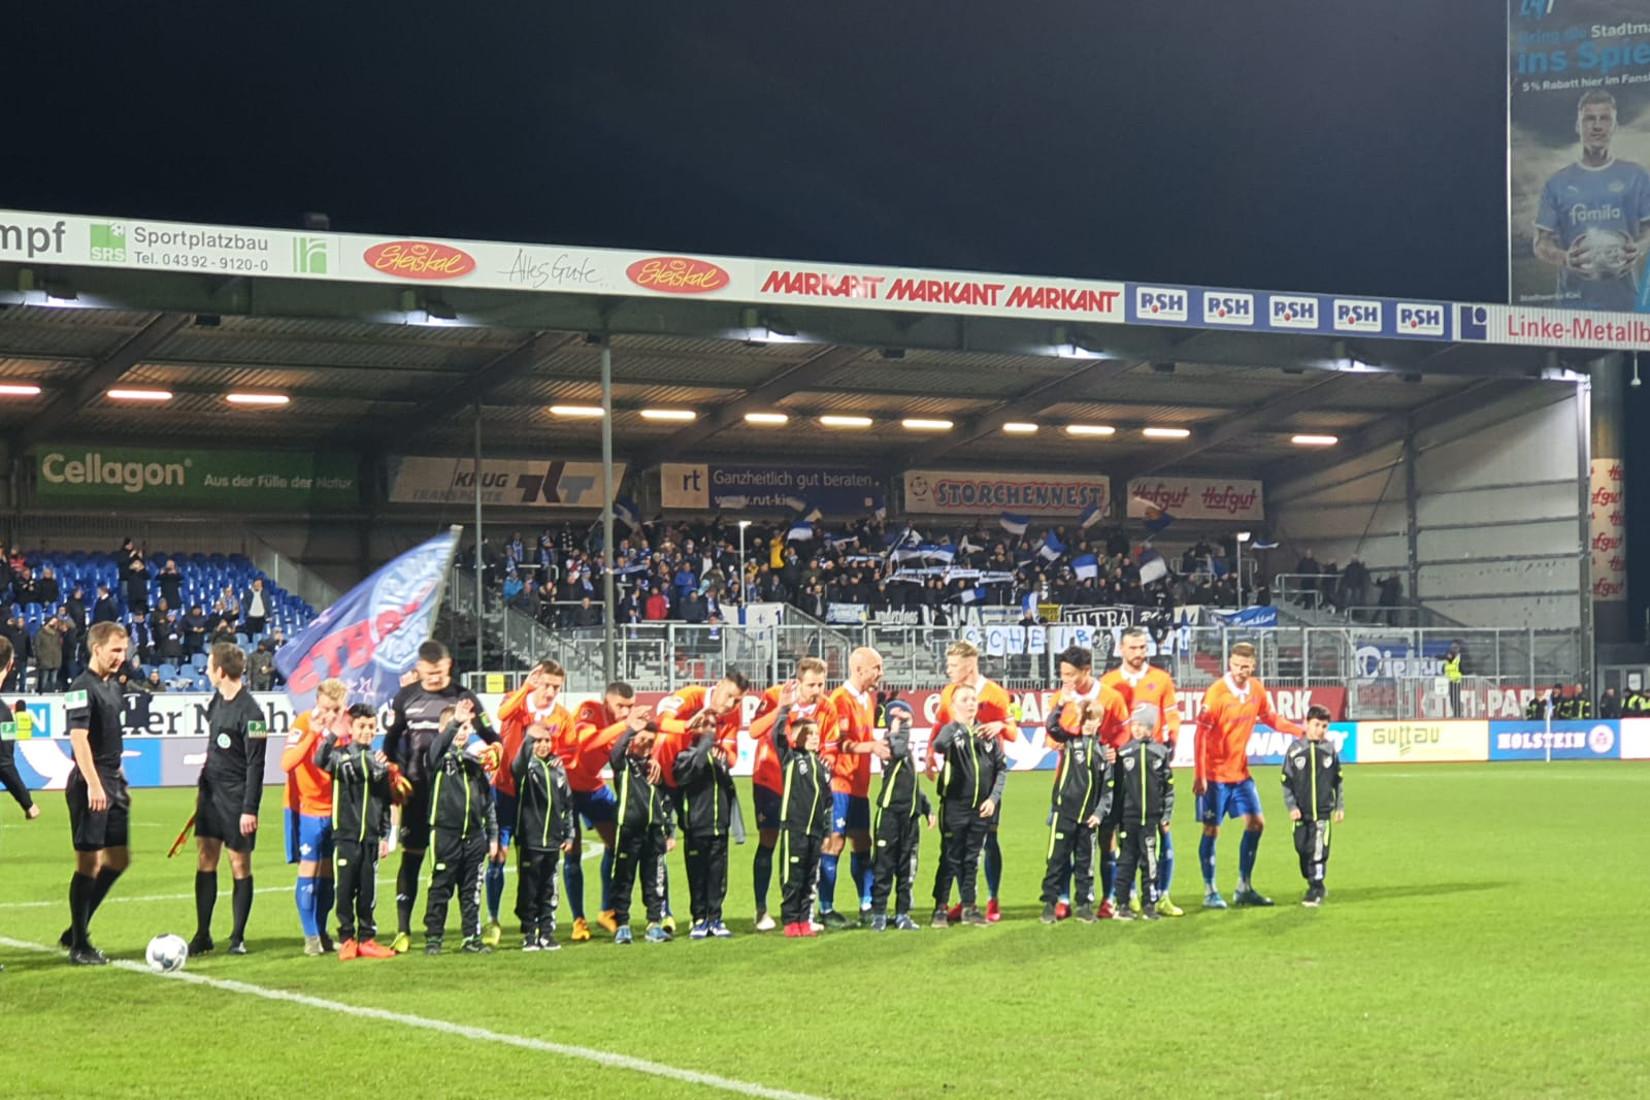 Holstein Kiel – SV Darmstadt 98 1:1 (1:1)